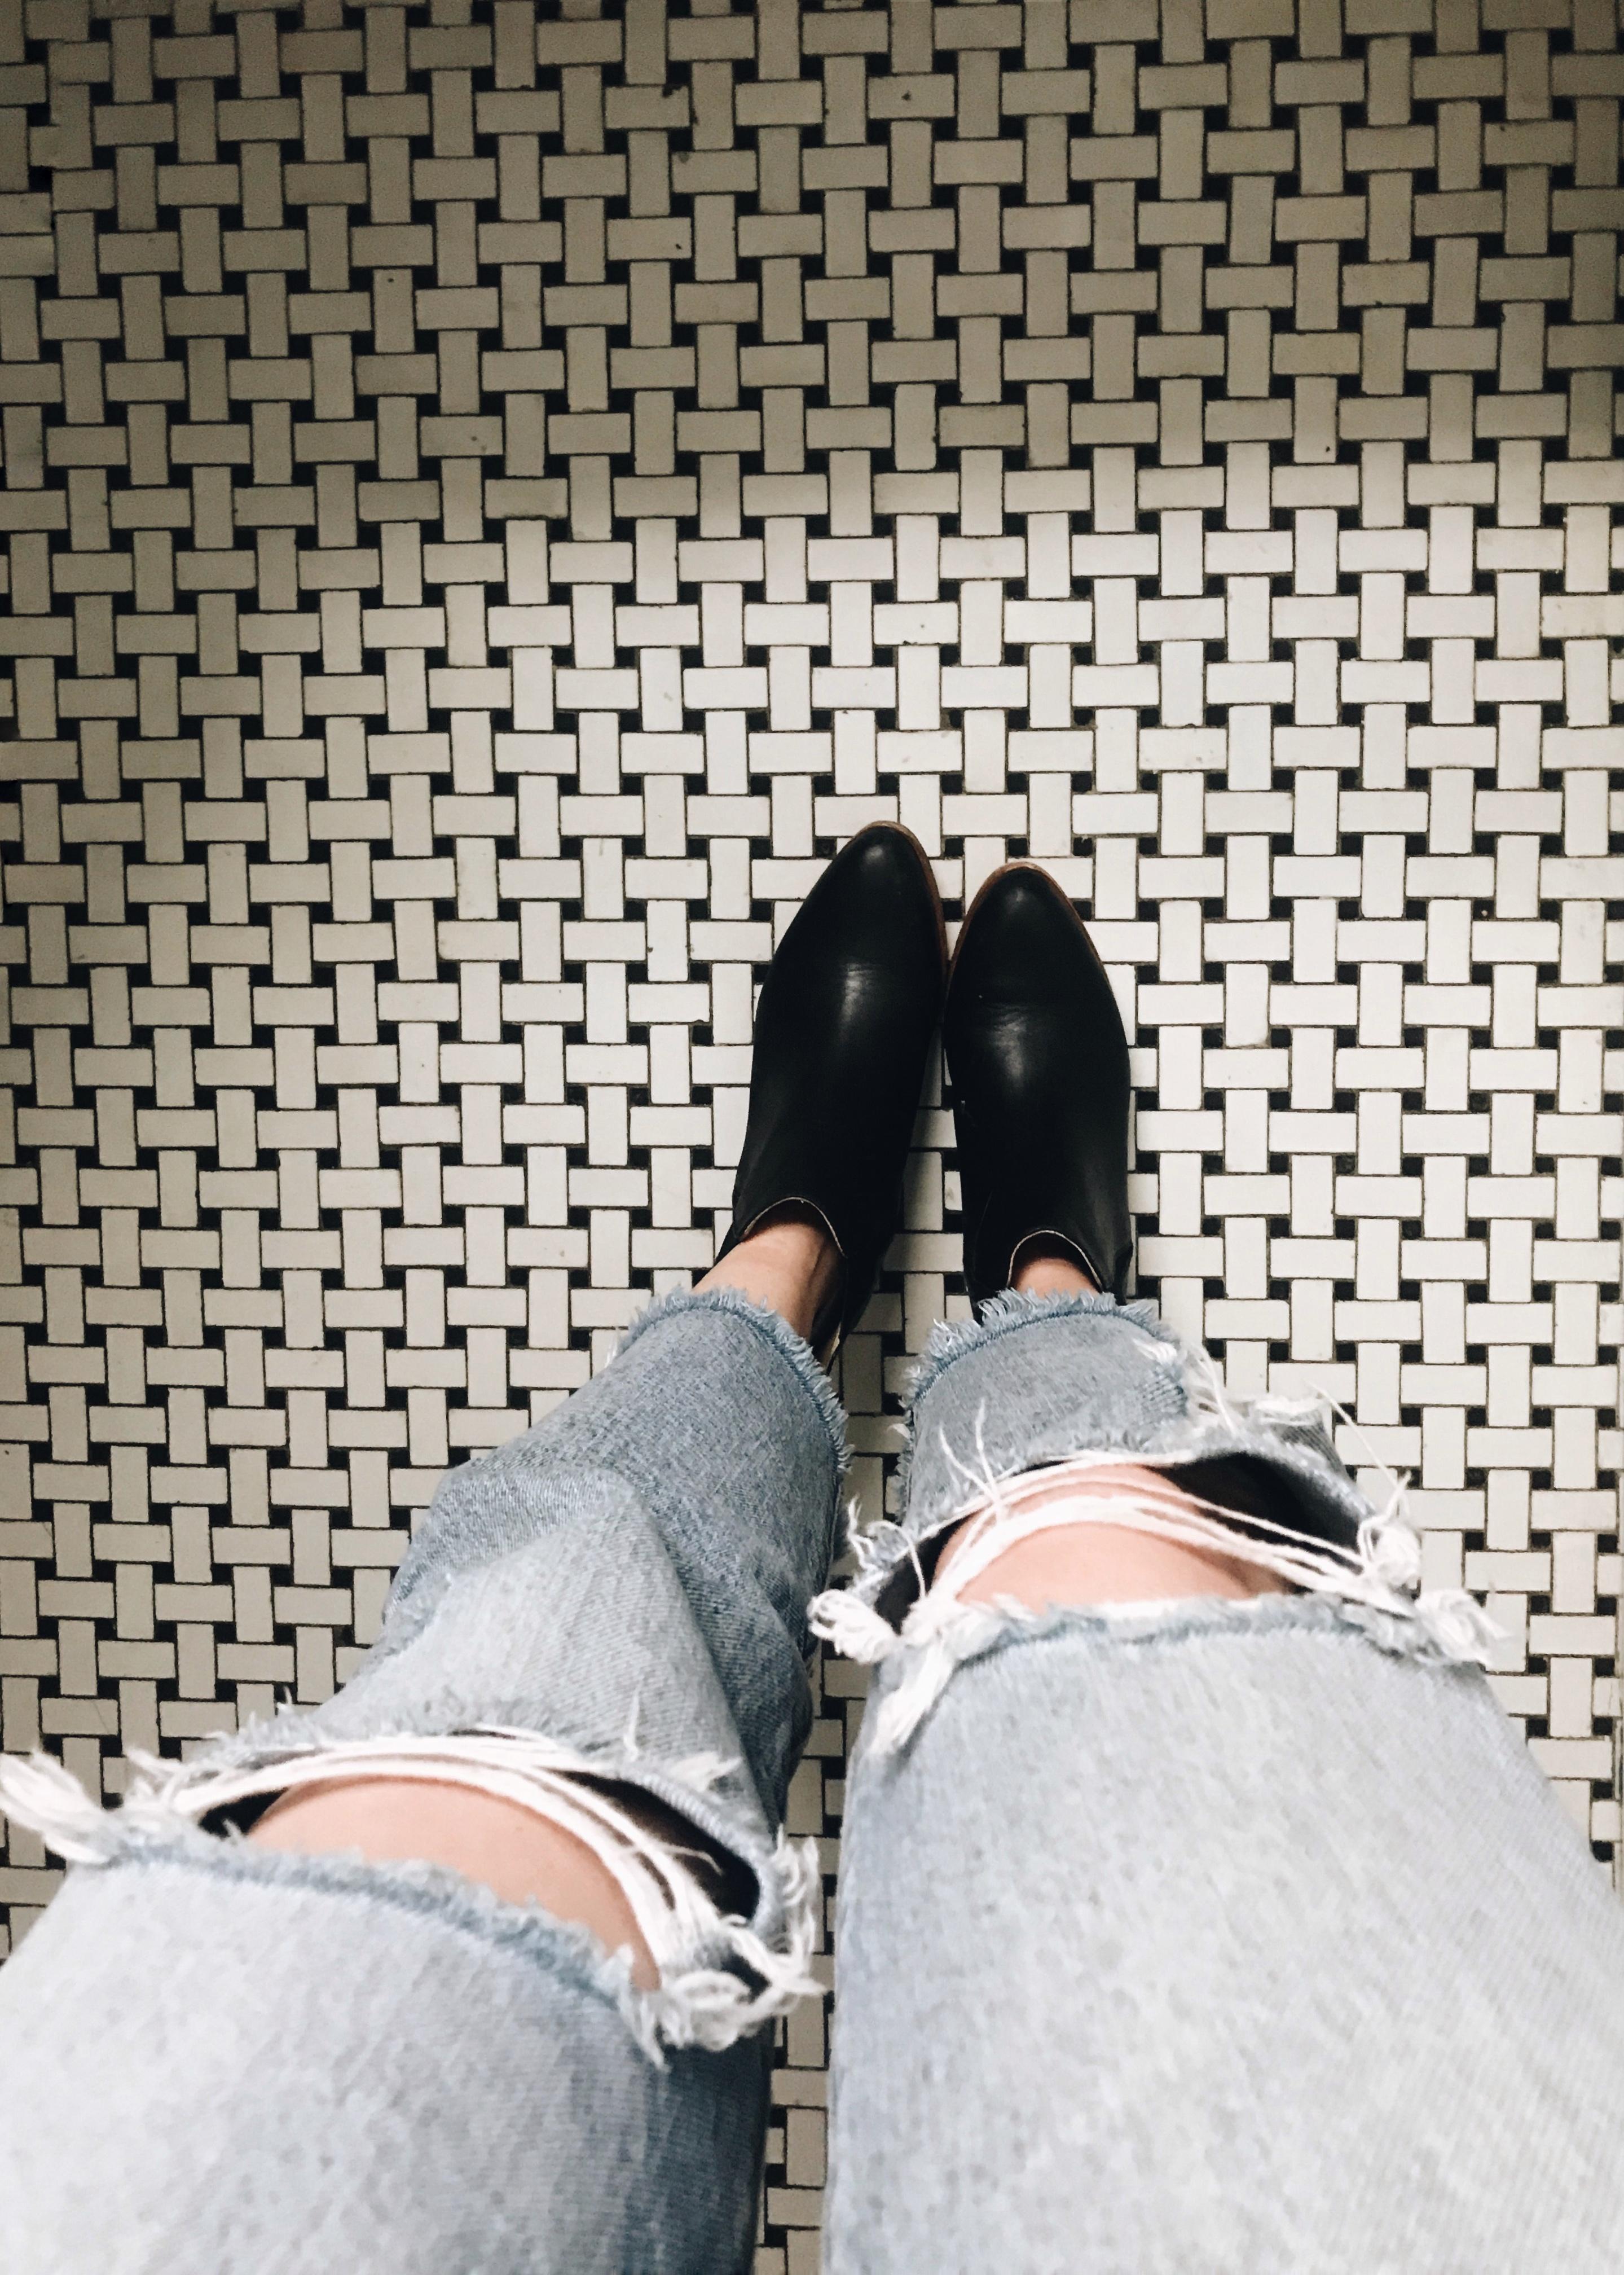 feet on tile